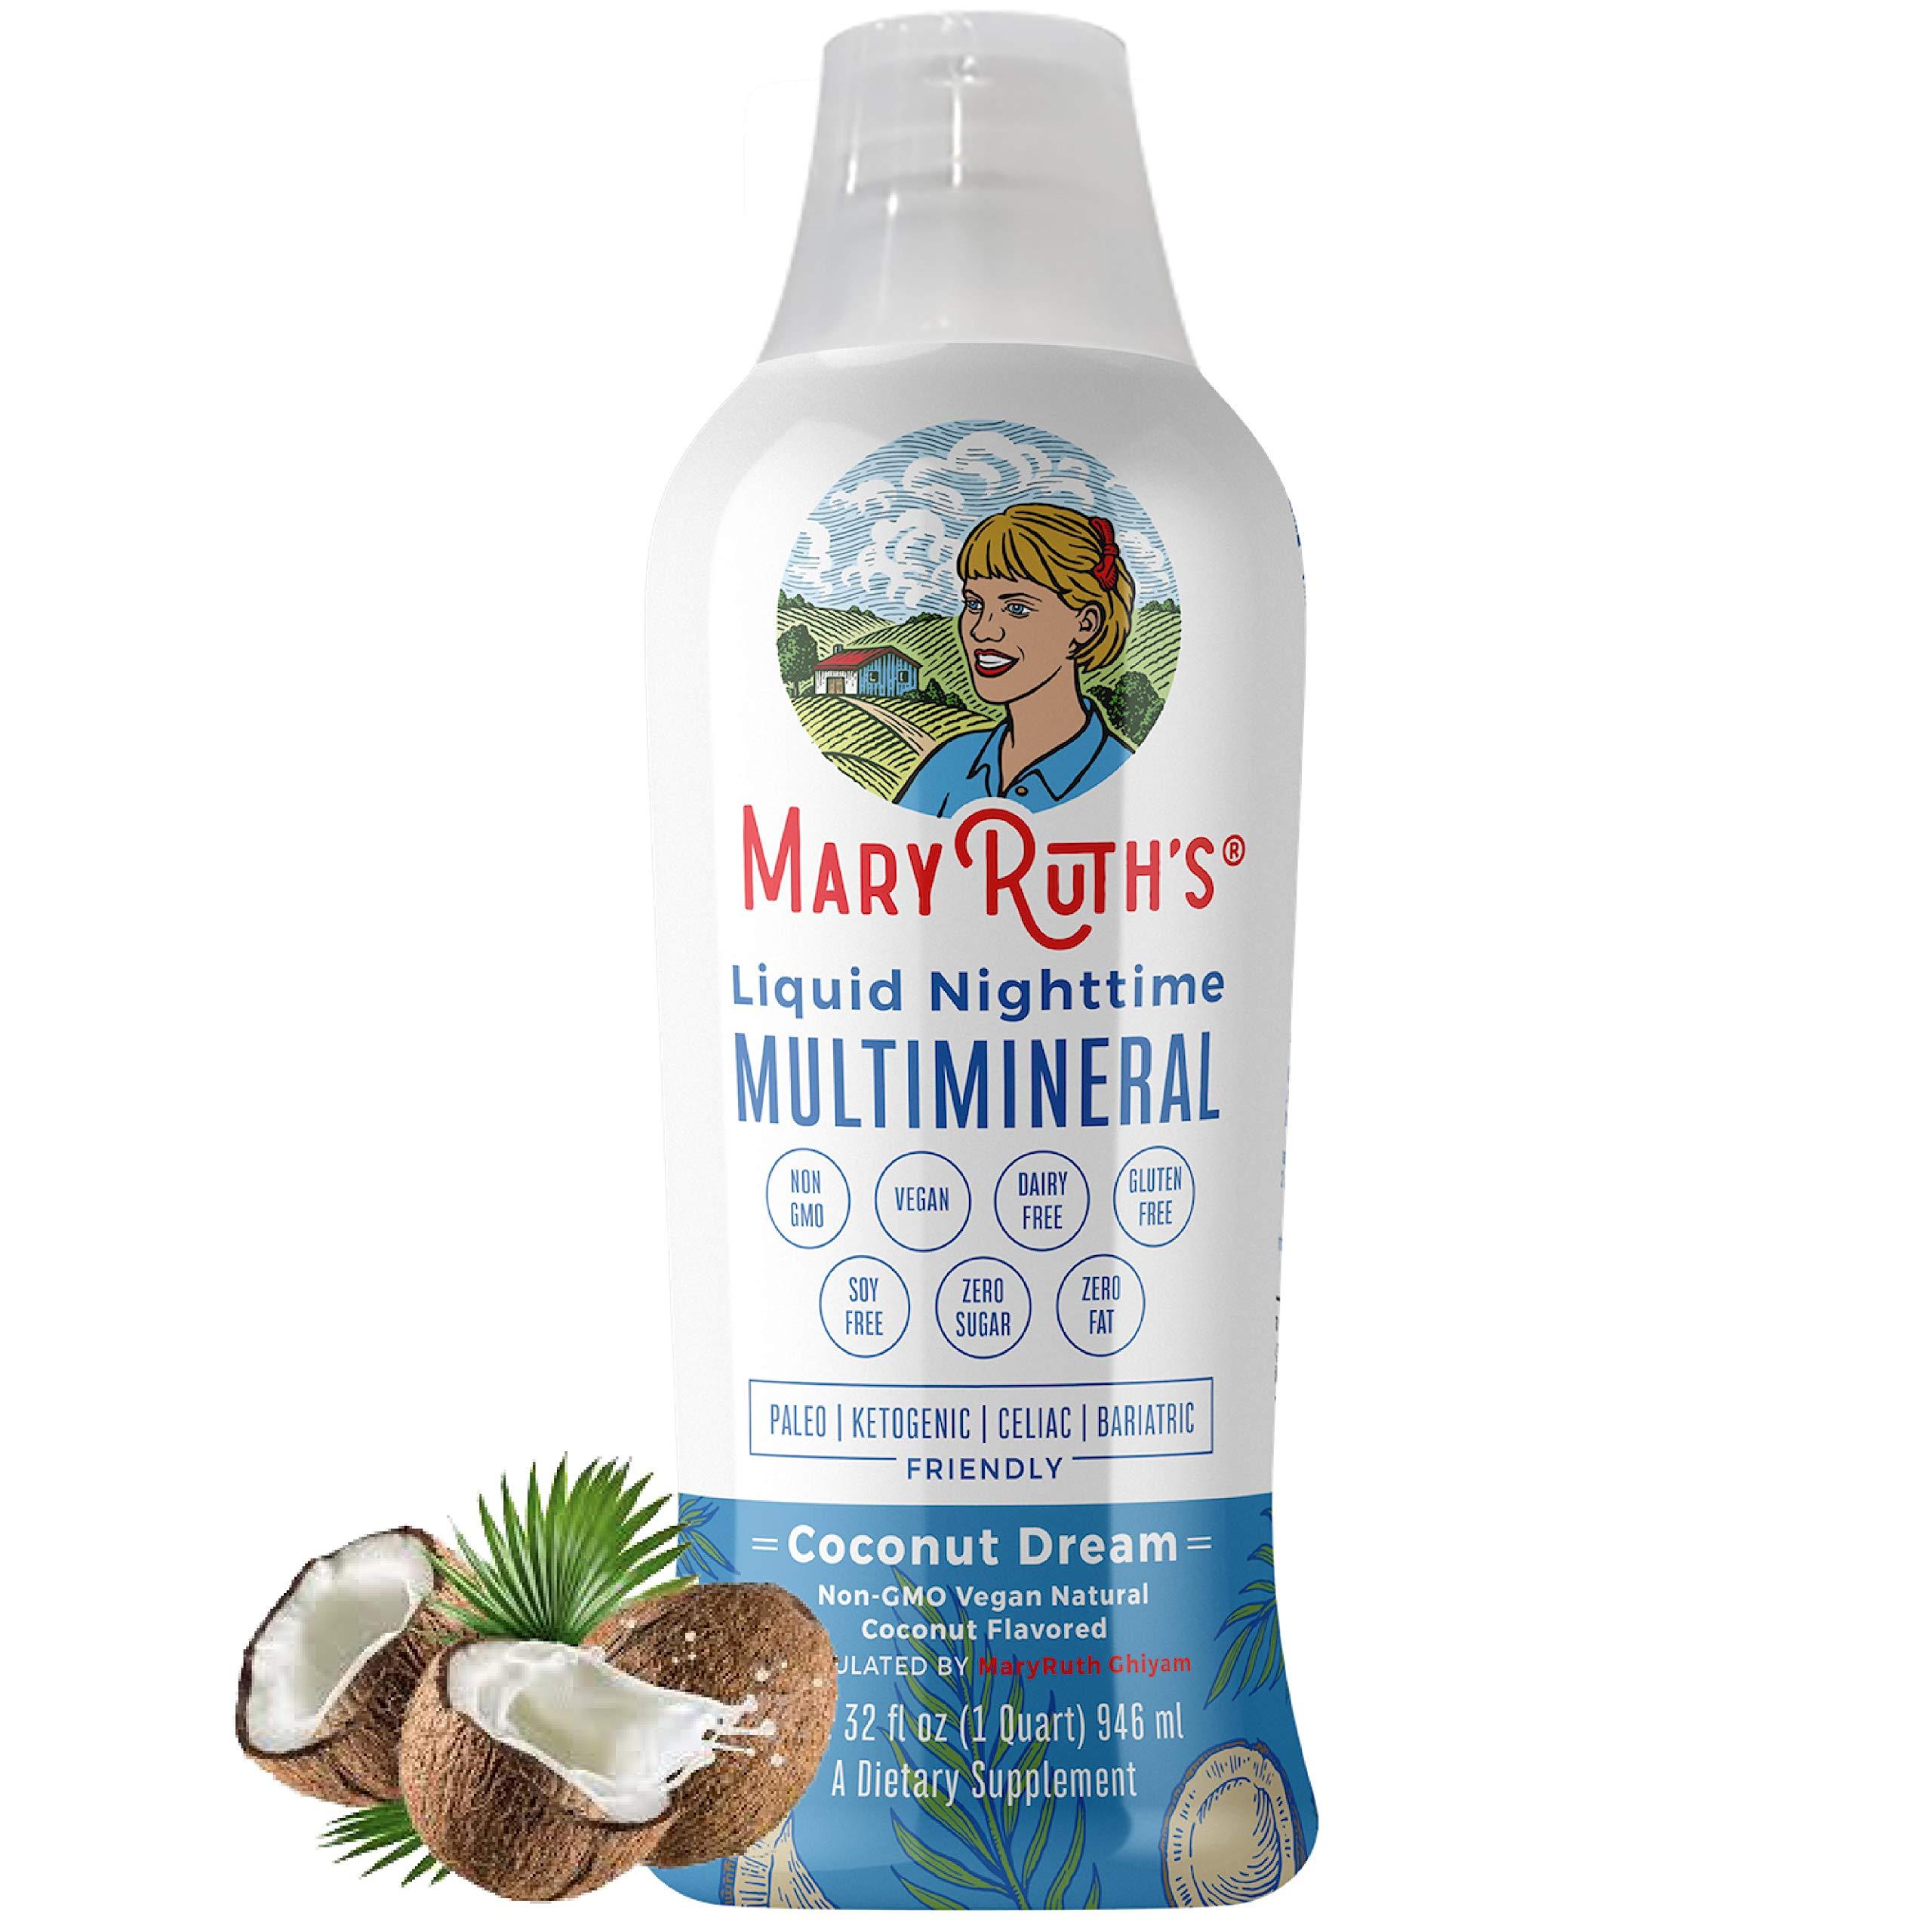 Liquid Sleep Multimineral by MaryRuth (Coconut) Vegan Vitamins, Minerals, Magnesium, Calcium & MSM - Natural Sleep & Stress Aid - Muscle Relaxation - NO Melatonin - Non-GMO Paleo 0 Sugar 0 Fat 32oz by MaryRuth Organics